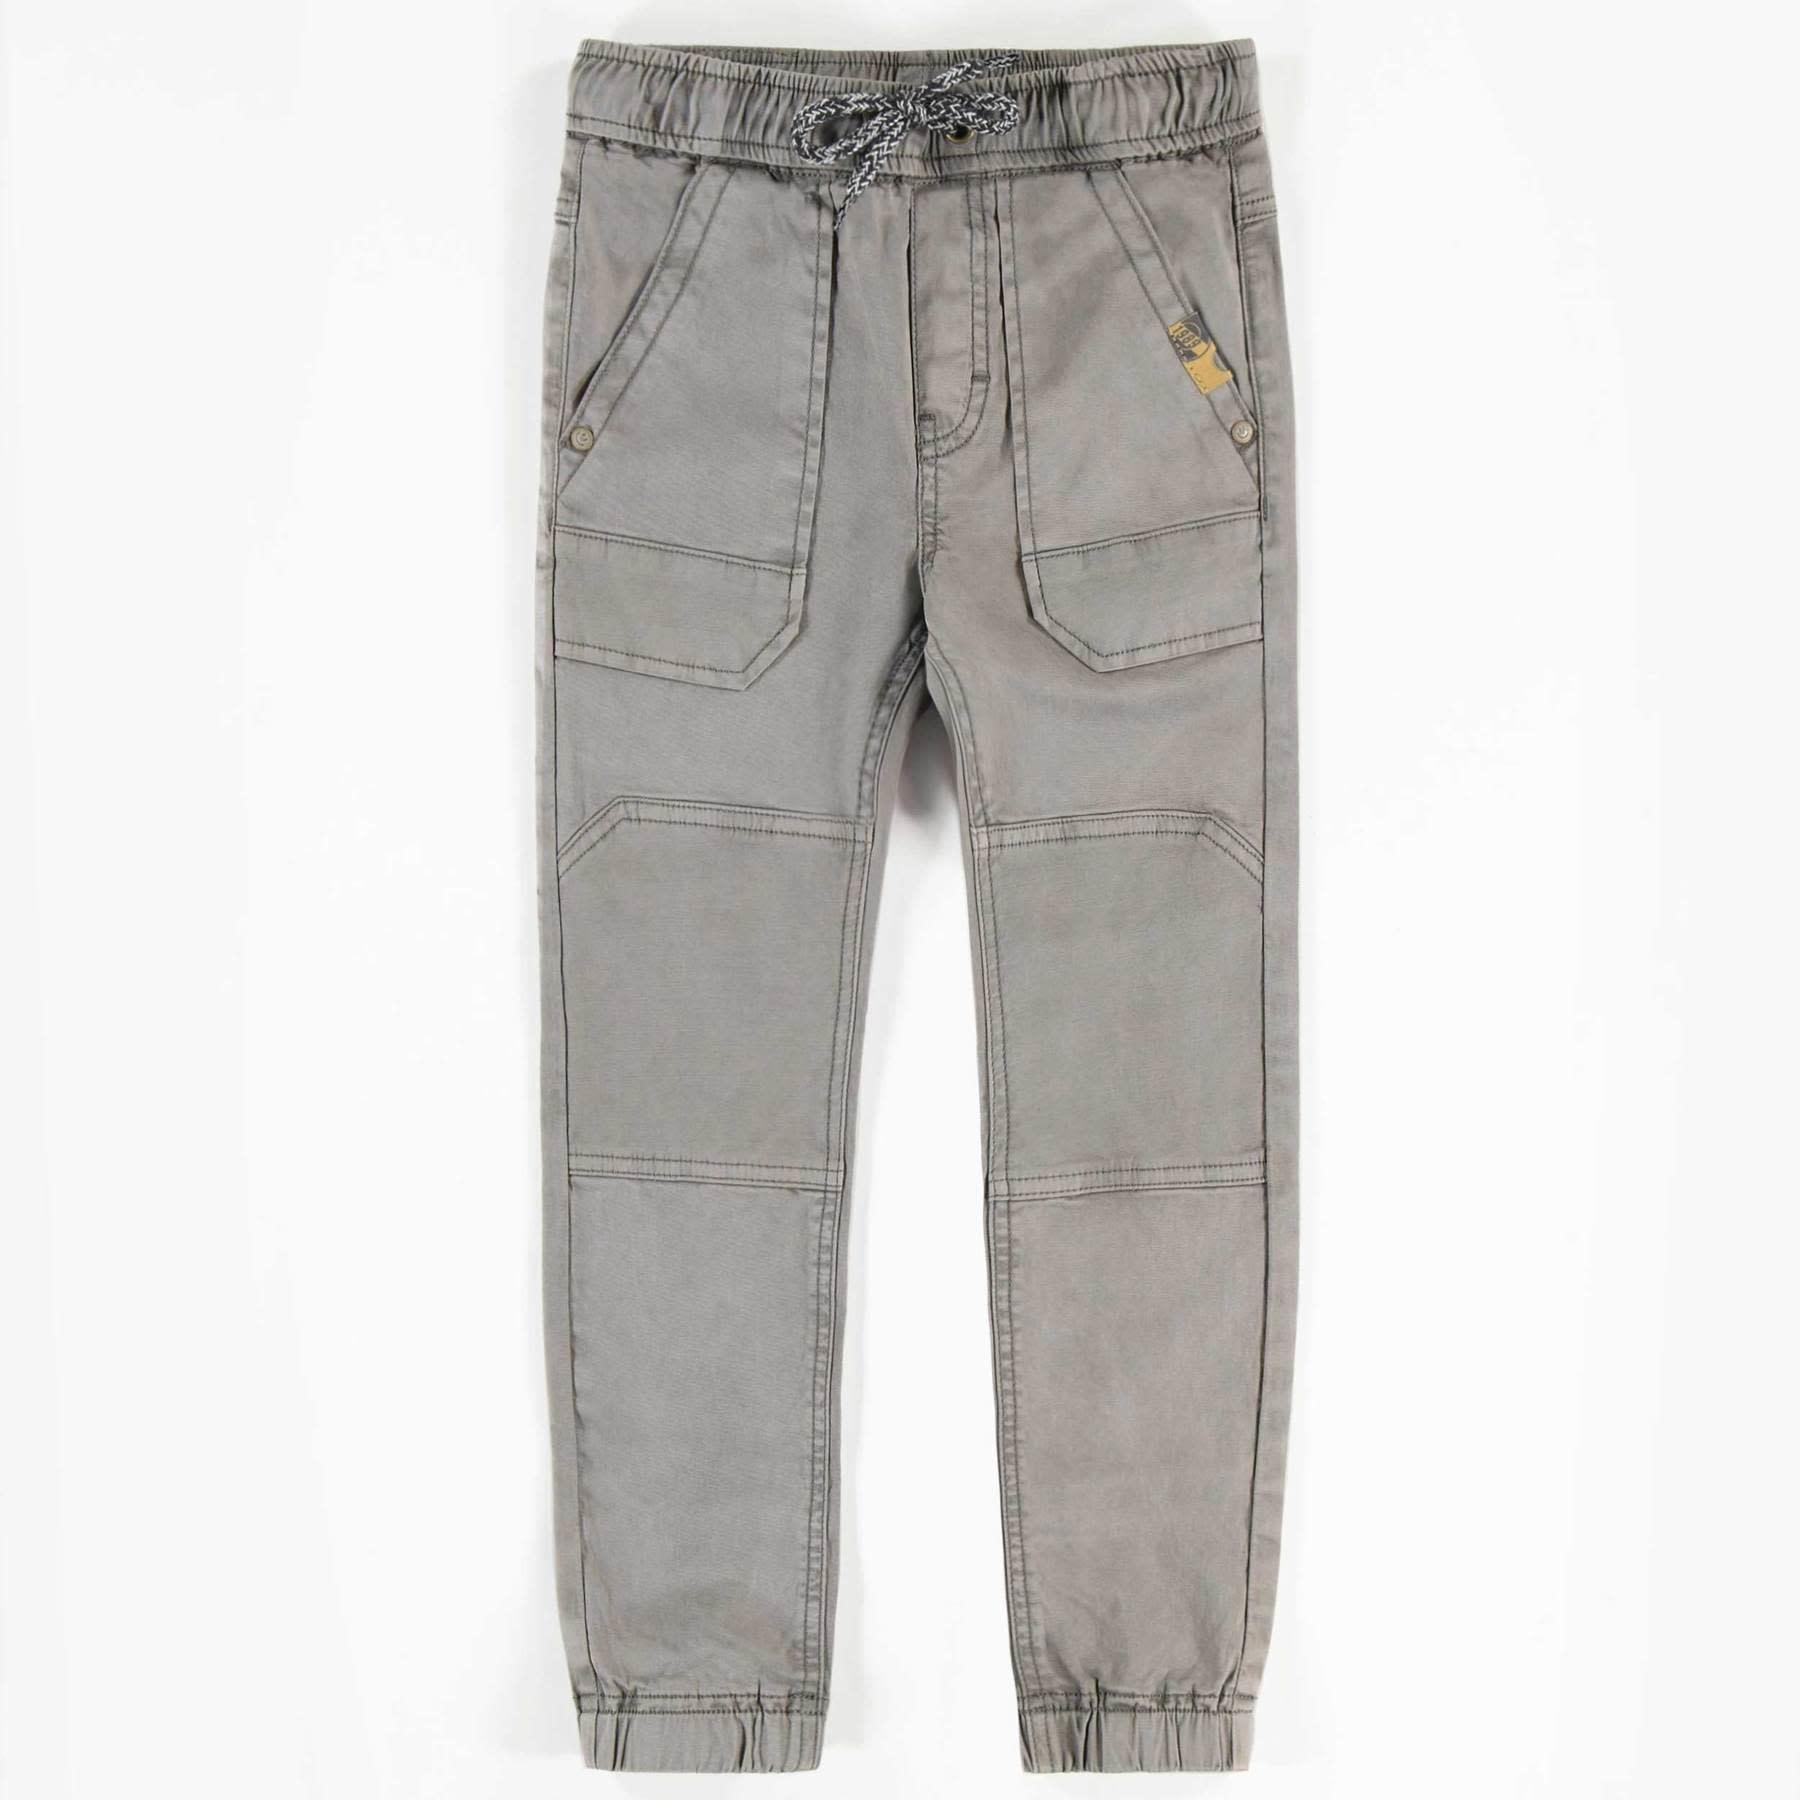 Sand Colored Denim Pants